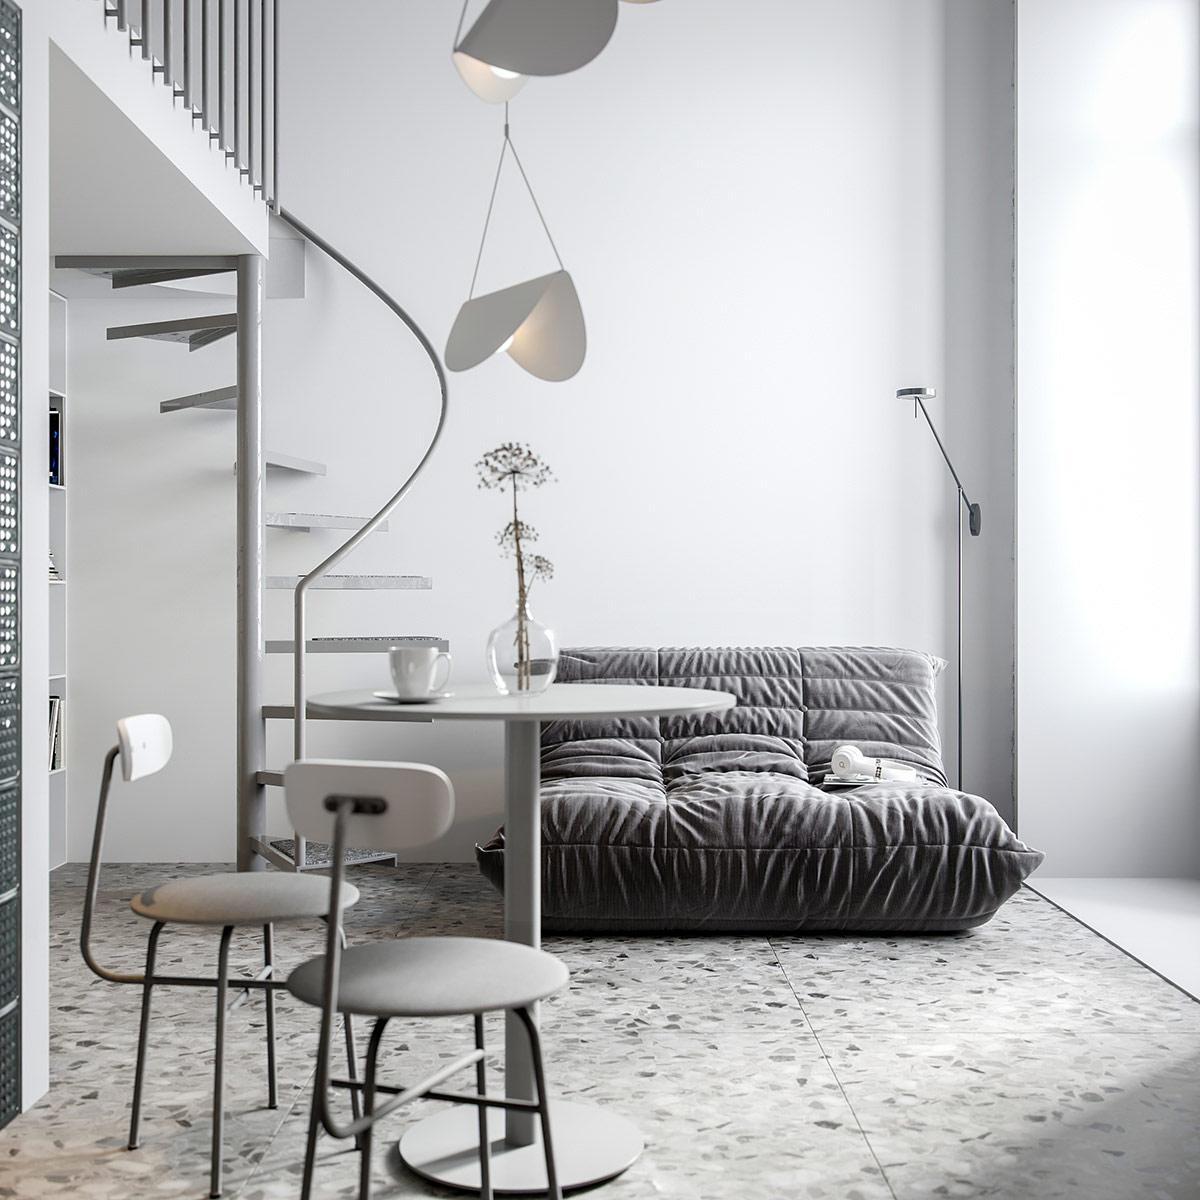 Inspire Slick Small Home Creativity